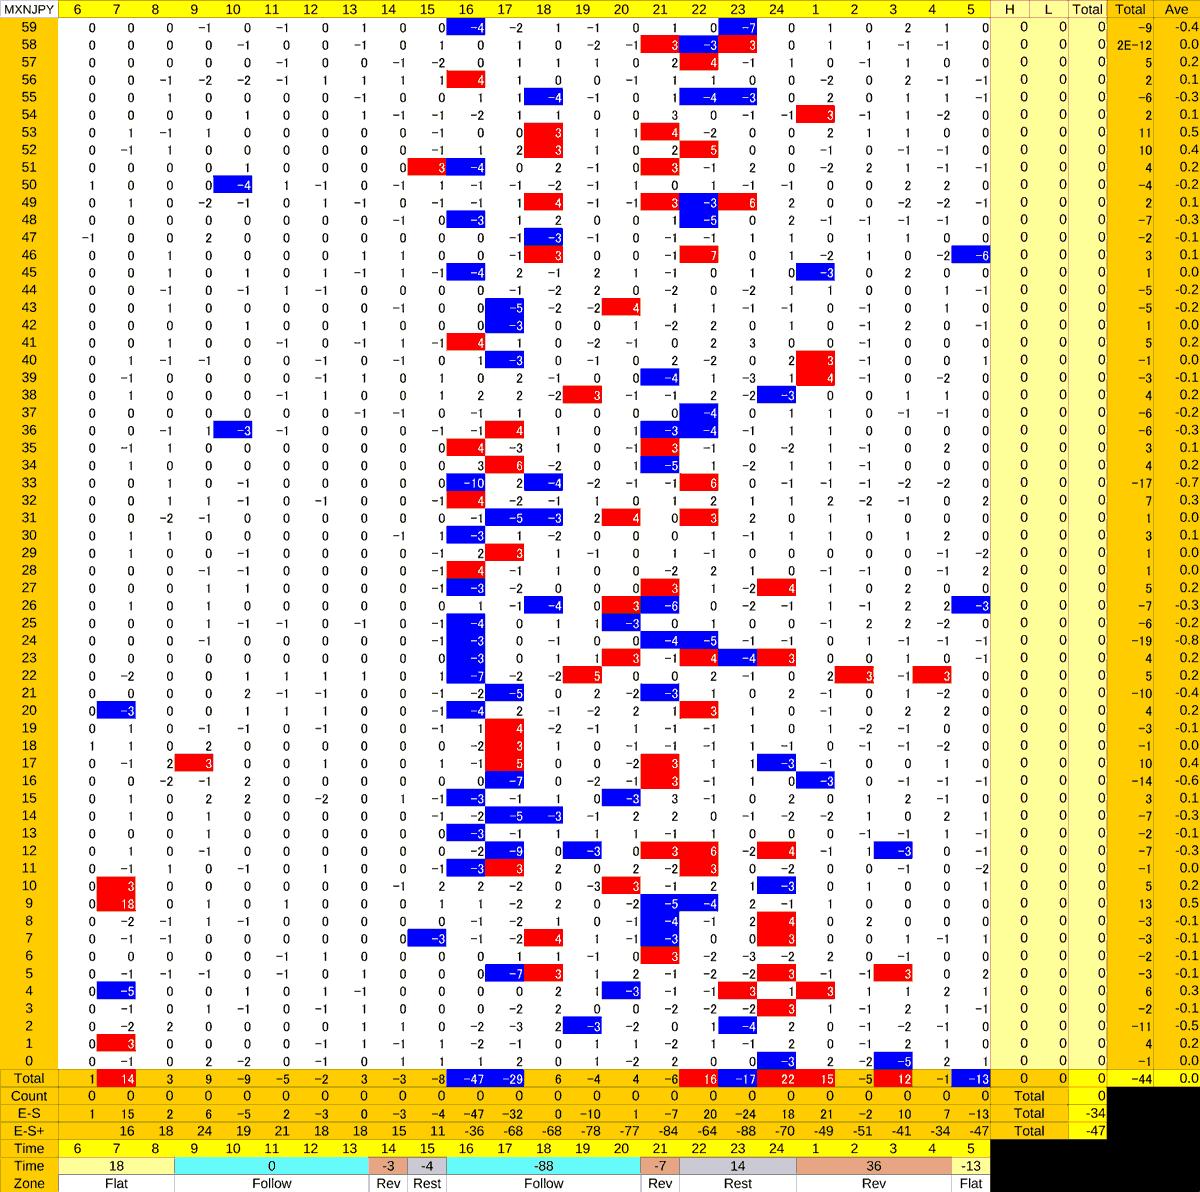 20200921_HS(3)MXNJPY